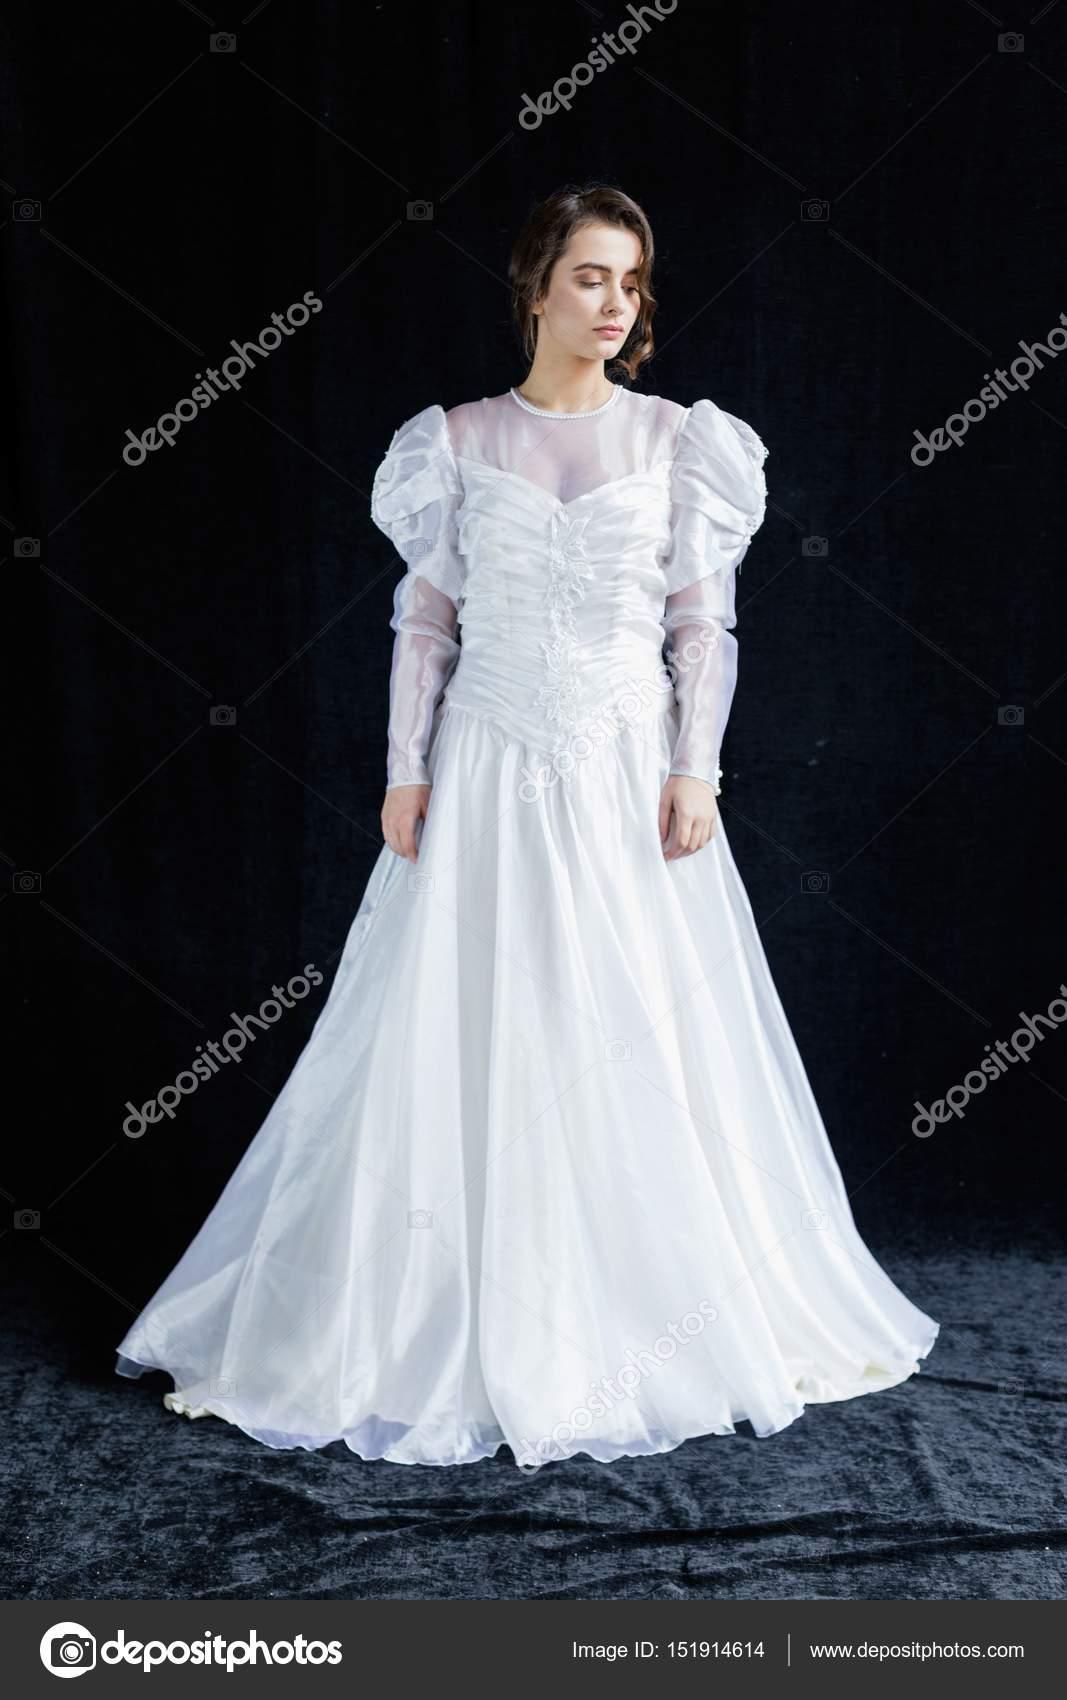 Frau in Vintage Brautkleid — Stockfoto © smmartynenko #151914614